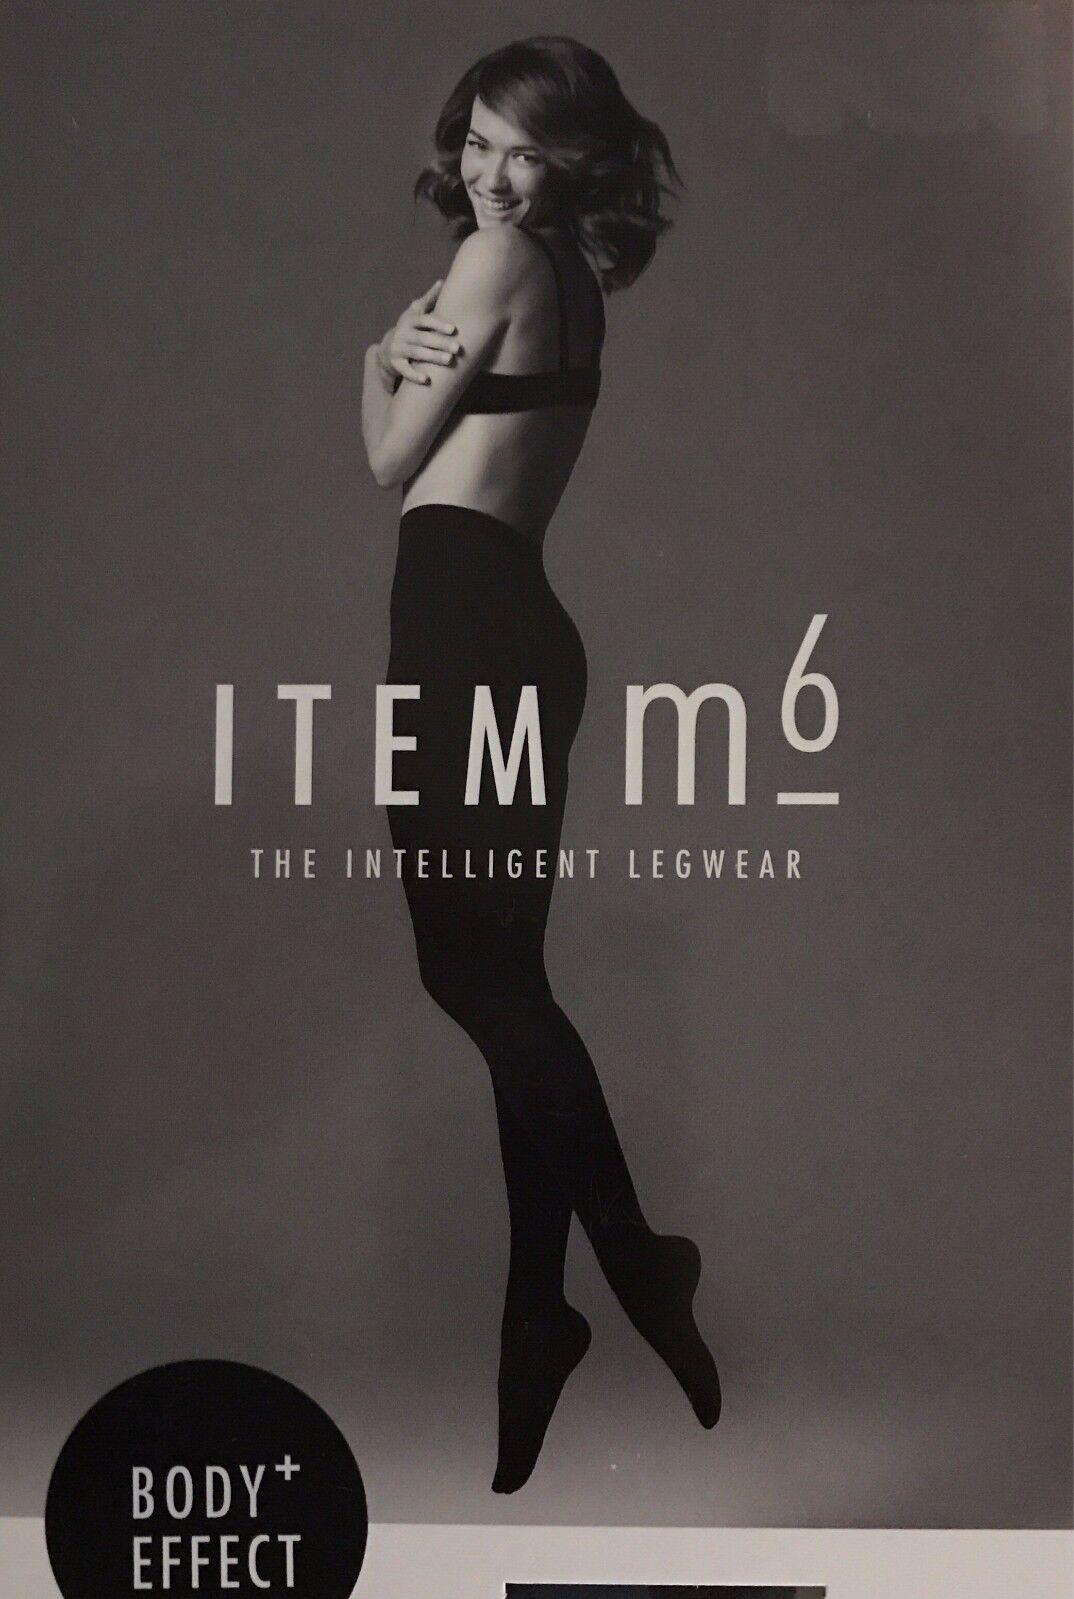 ITEM m6 Women's Tights Opaque  Body + Effect Medi compression FD1HU - 07